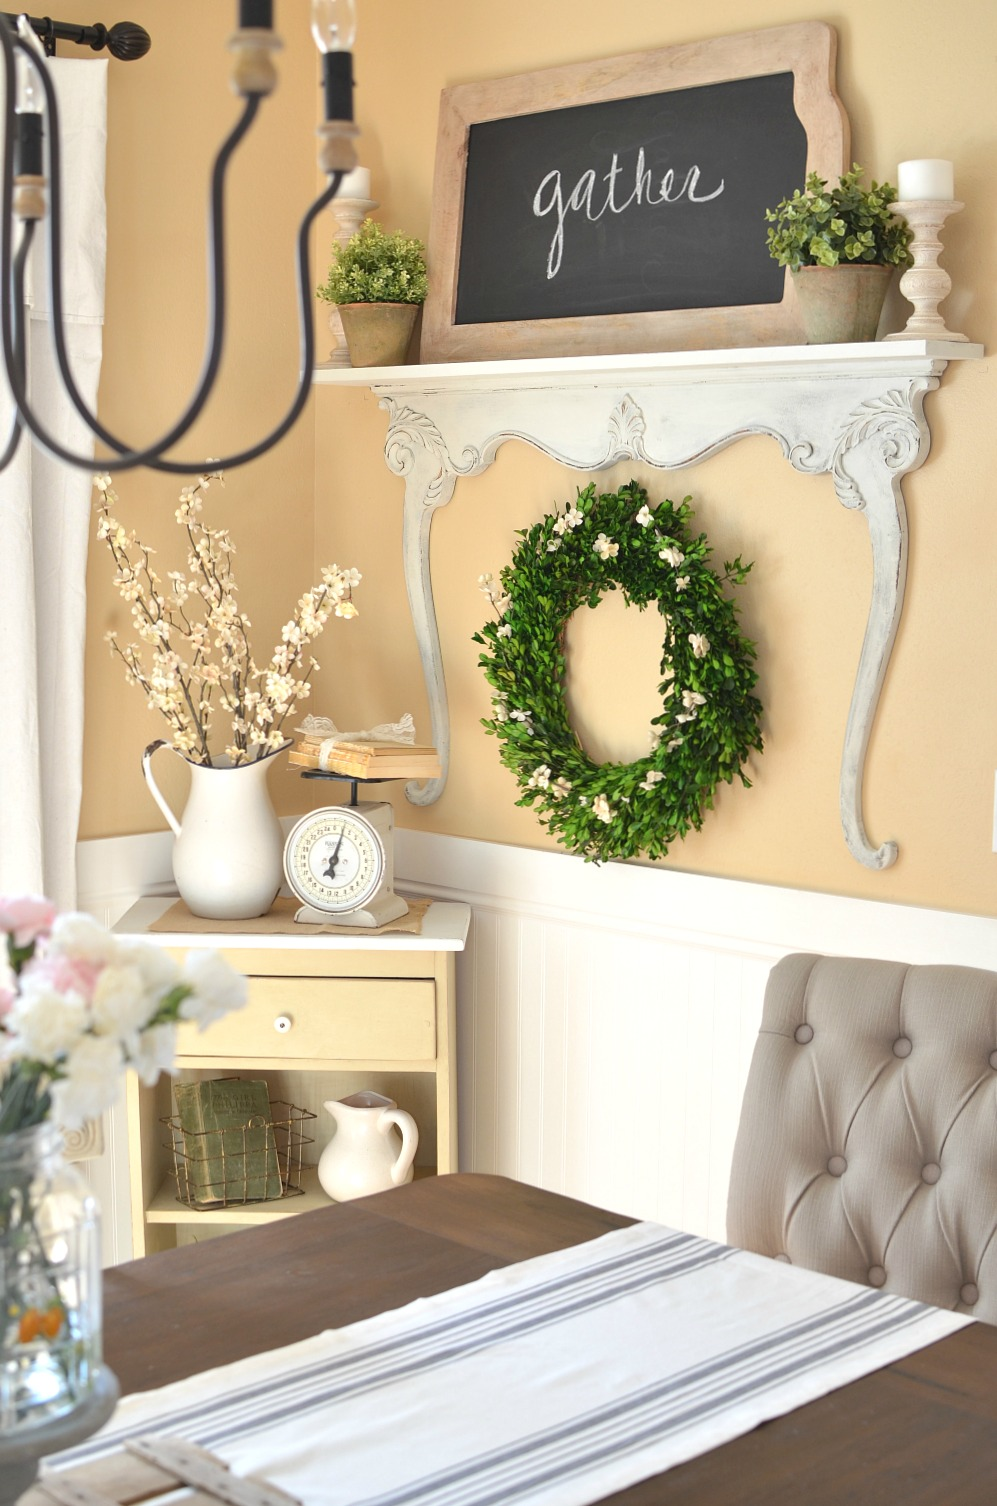 DIY Shelf with Vintage Dresser Harp. Vintage farmhouse style shelf and decor.